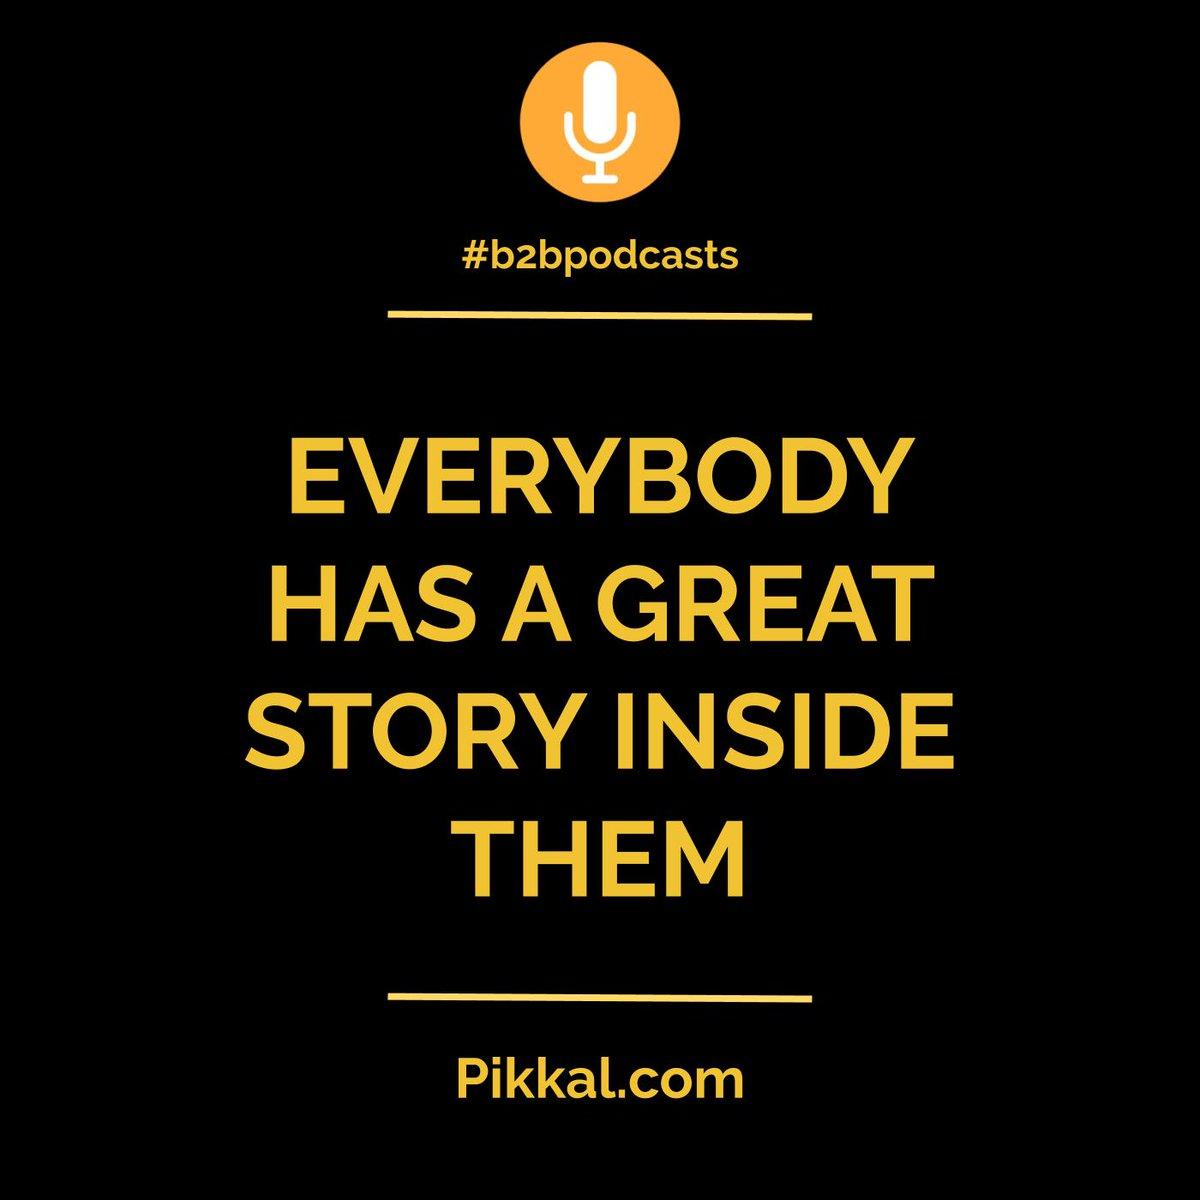 Monday Jun 1, 2020 #podcasting #podcasts #b2bpodcasts #storytellingpic.twitter.com/iE2J9q9sKN